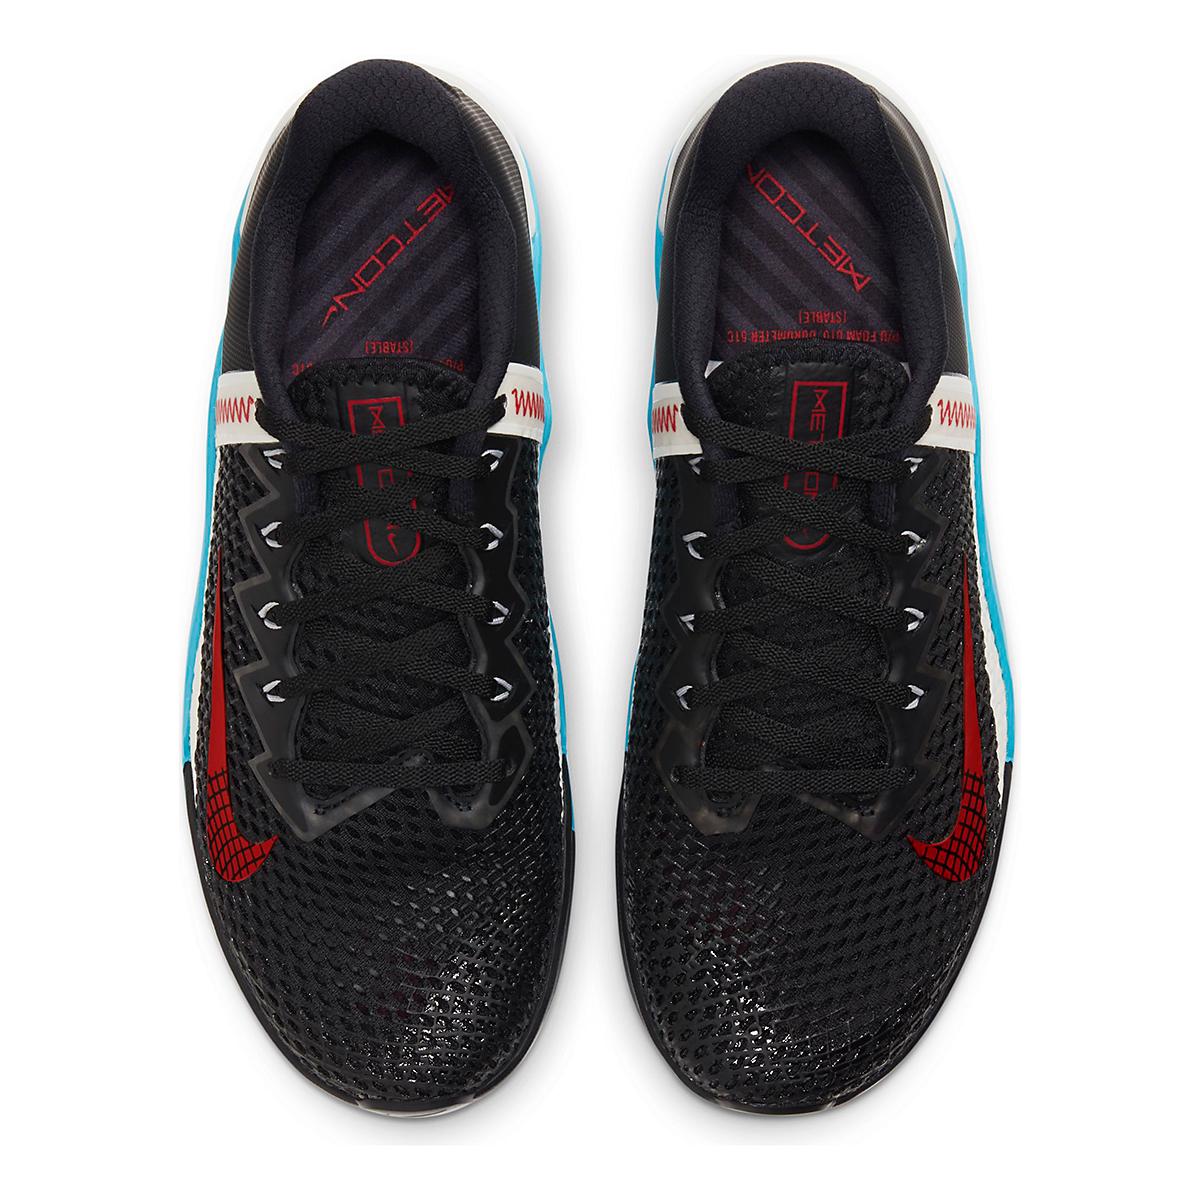 Men's Nike Metcon 6 Training Shoes - Color: Black/University Red/Light Blue Fury - Size: 5 - Width: Regular, Black/University Red/Light Blue Fury, large, image 4